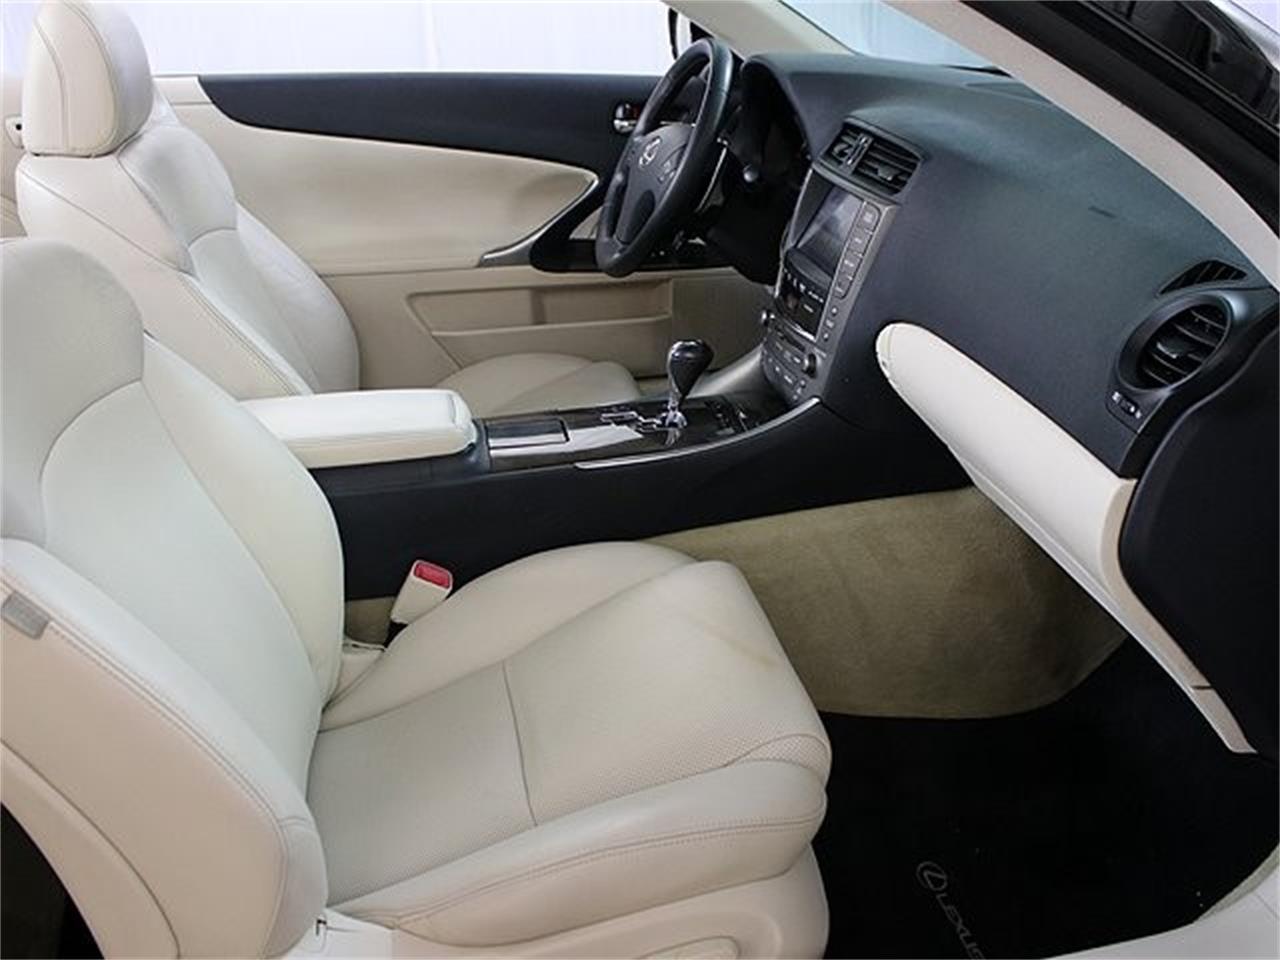 2010 Lexus IS350 (CC-1236964) for sale in Addison, Illinois